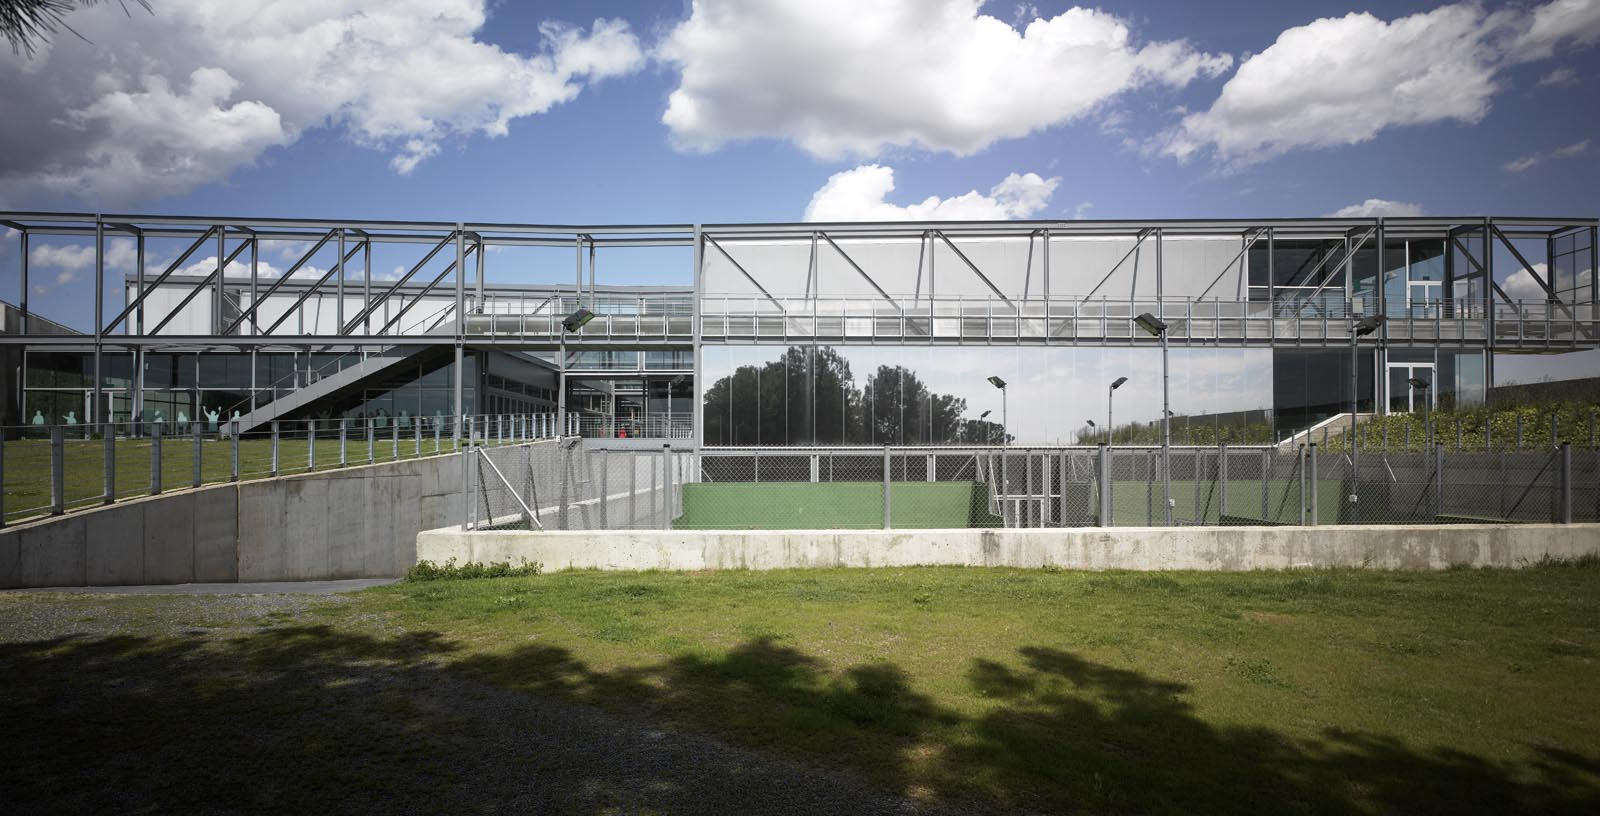 Pau_Gasol_Sports_Center-01-Architecture-IDOM-photo-Eugeni_Pons